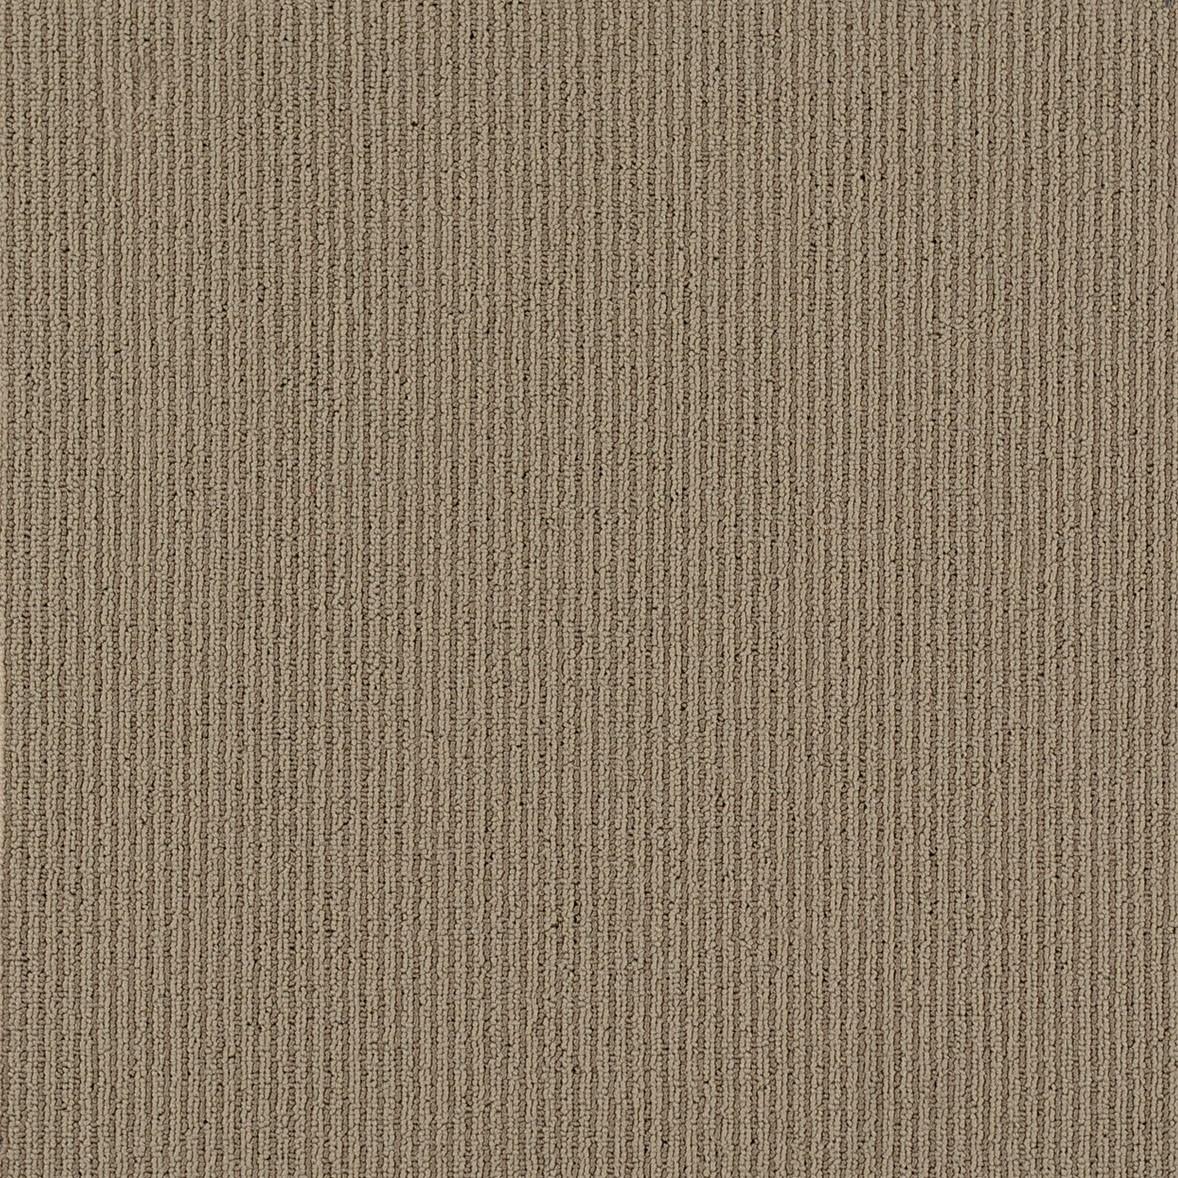 Polypropylene Striped Tufted Carpet Manufacturers, Polypropylene Striped Tufted Carpet Factory, Supply Polypropylene Striped Tufted Carpet